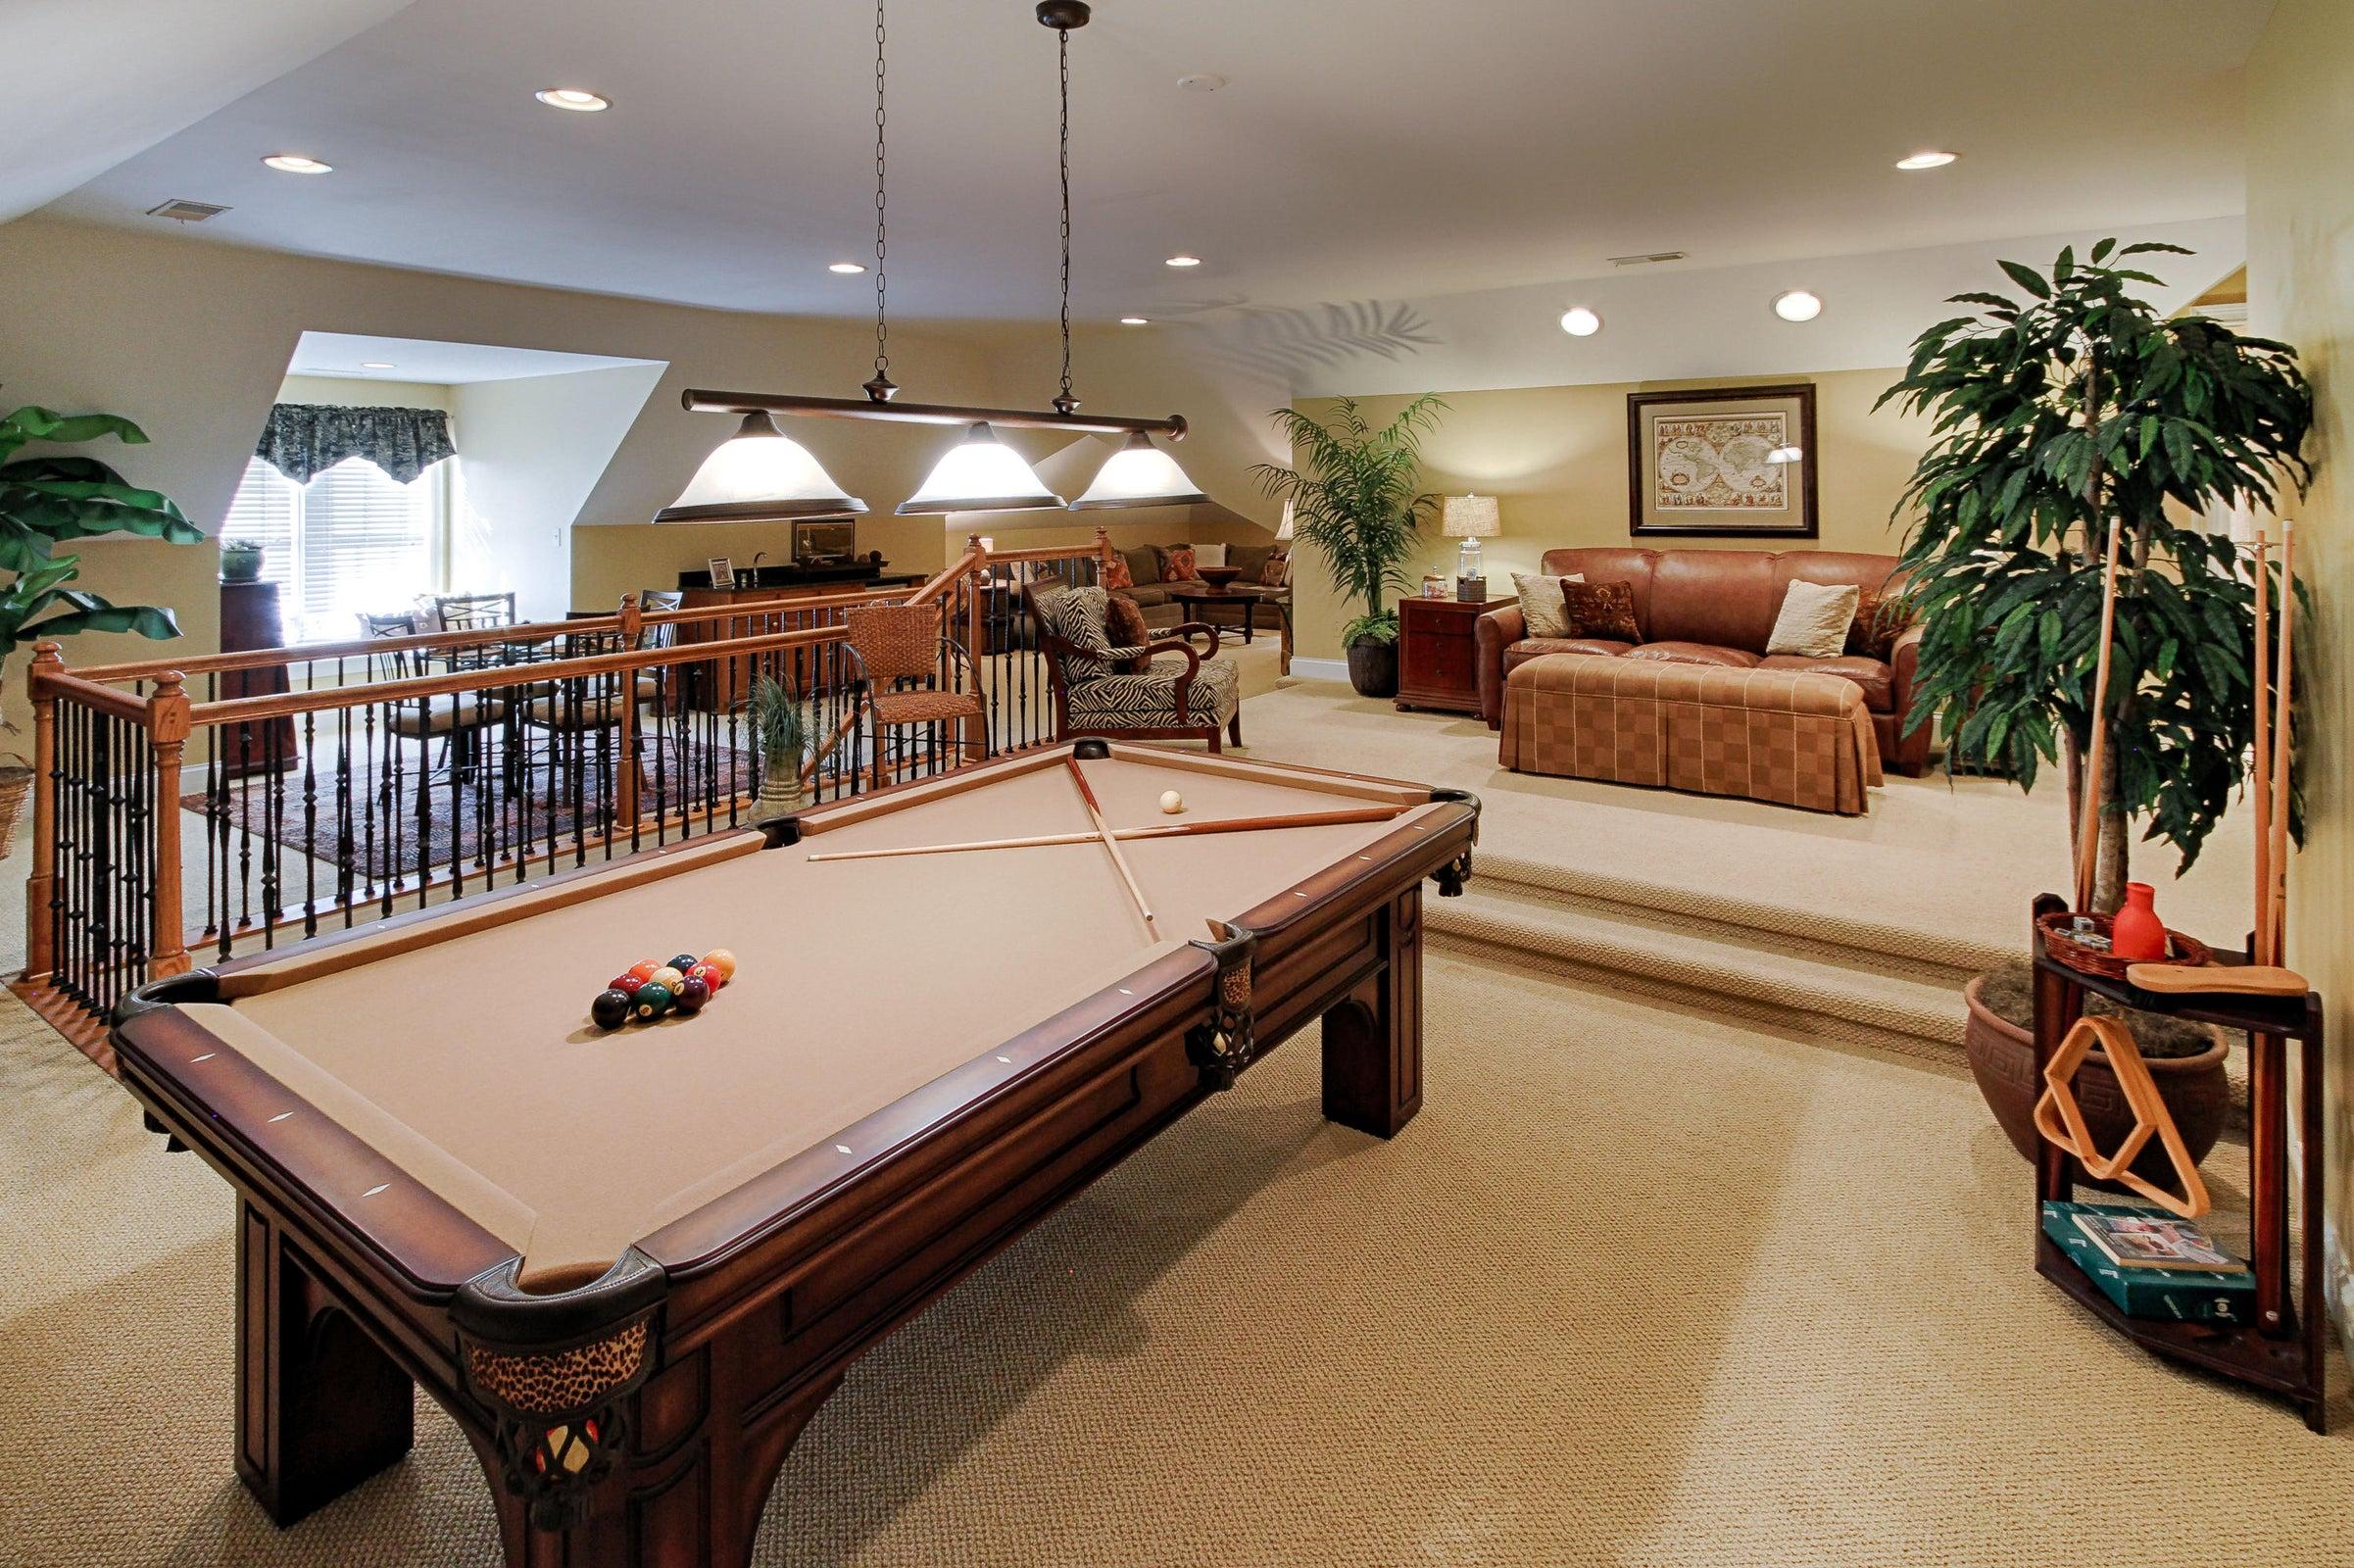 25 - Bonus Room has large open areas